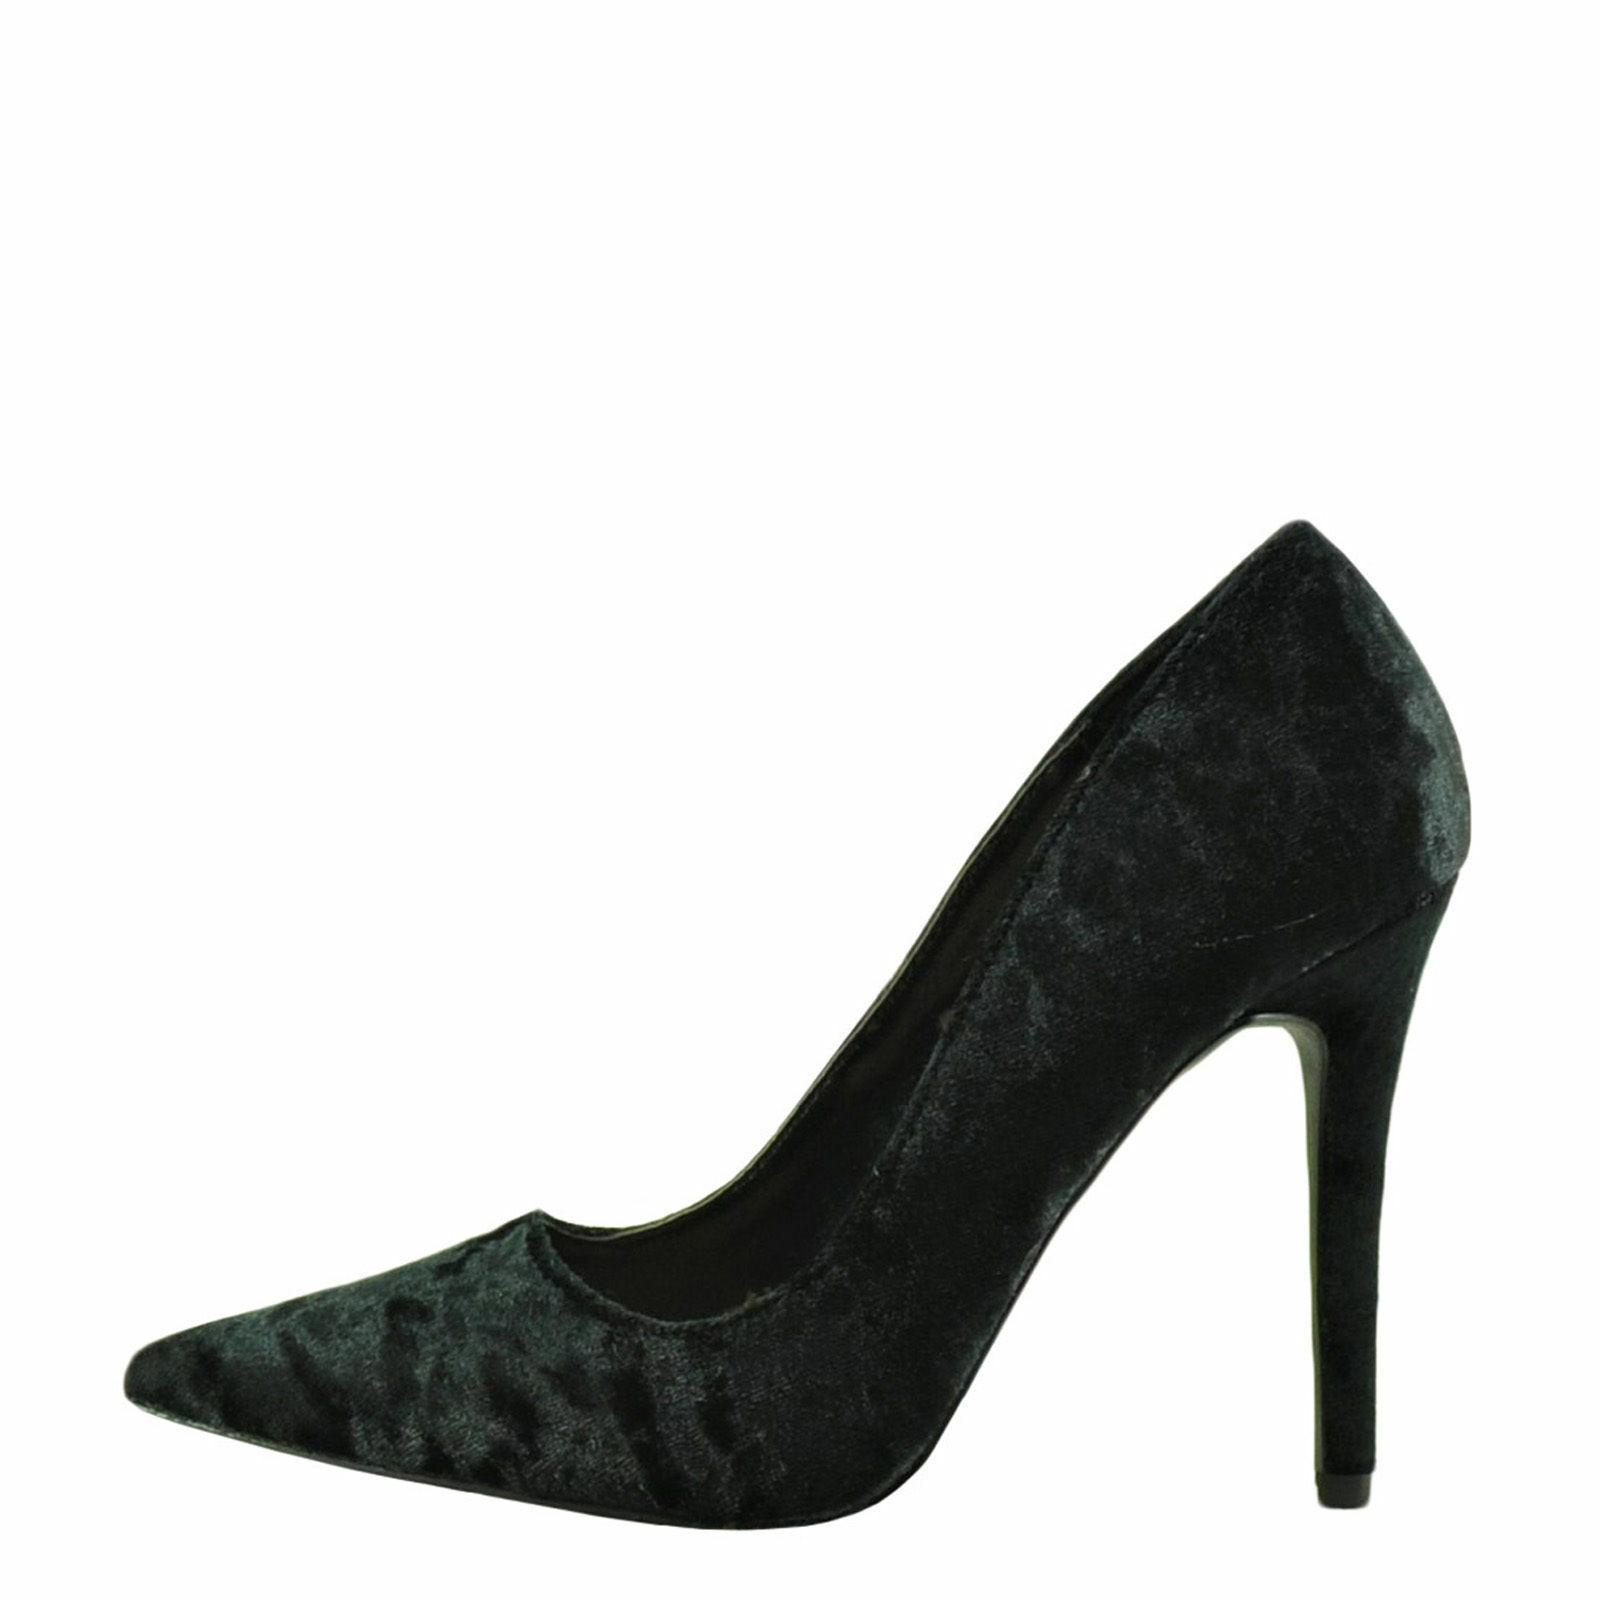 Qupid Milia 01 Black Women's Crushed Velvet Pointed Toe Pumps - $28.95